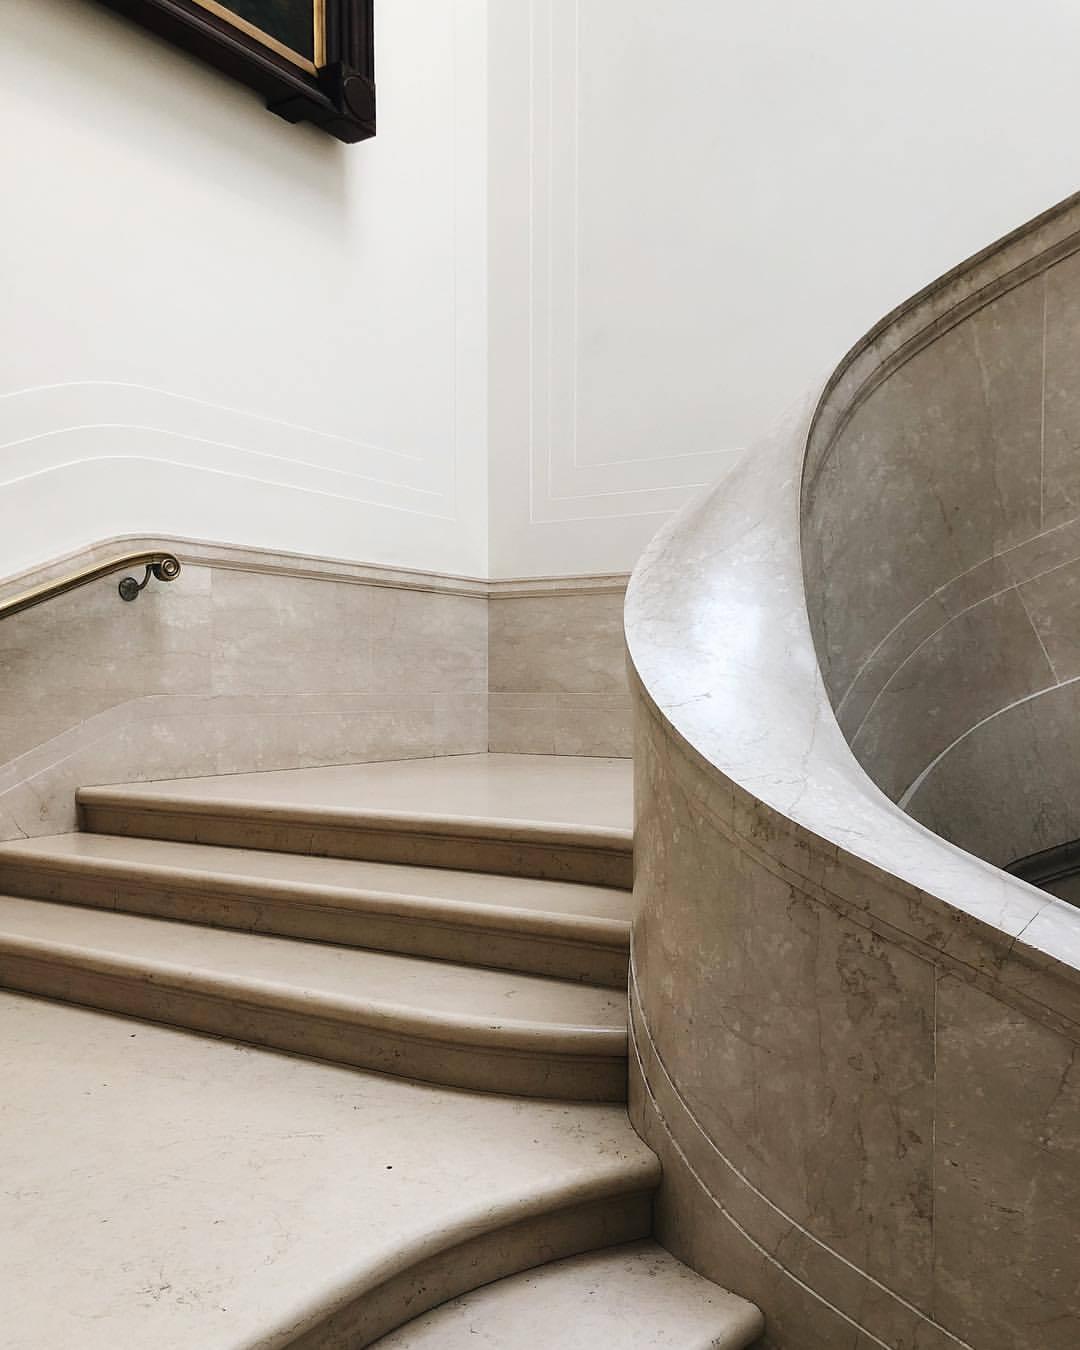 Museum corners at National Gallery of Art @   mindykoenigsfeld